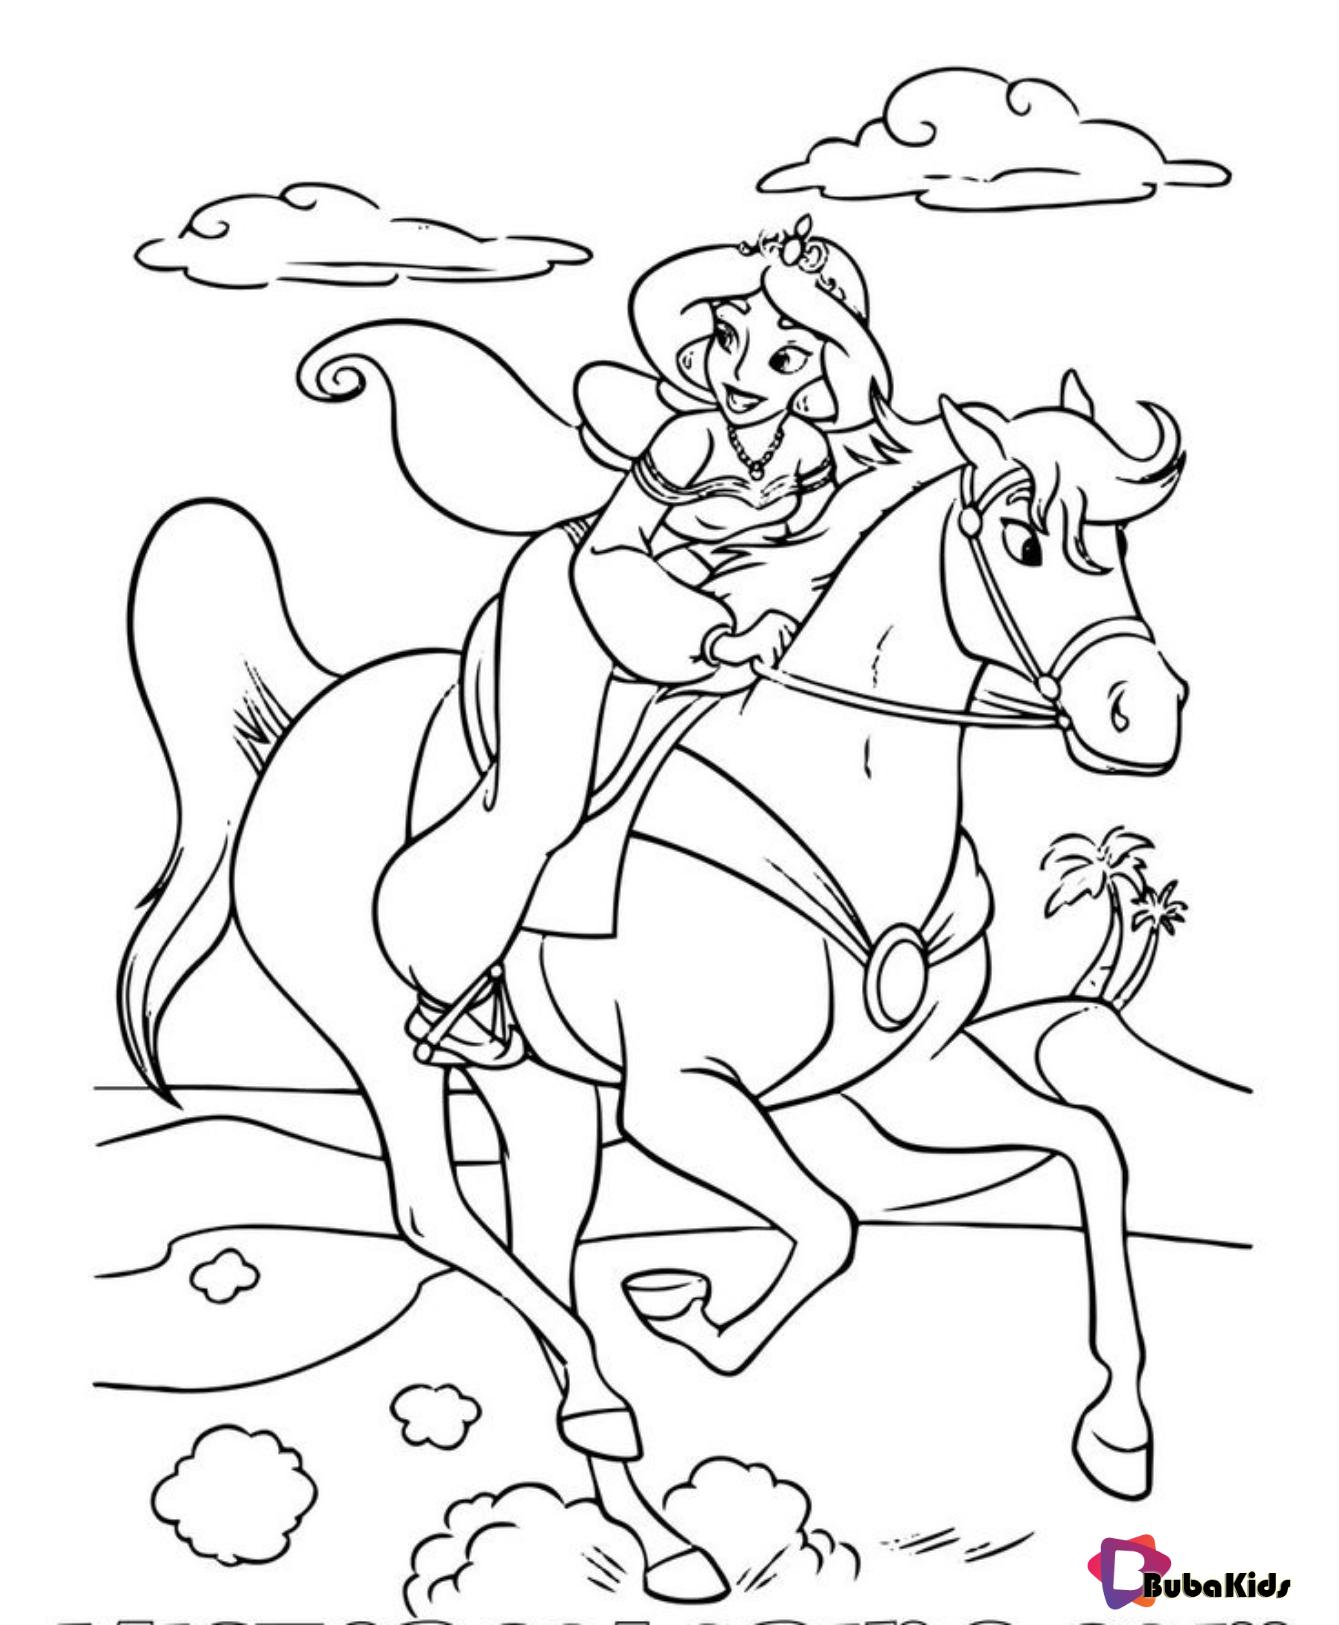 Princess Jasmine Riding Sahara Aladdin Coloring Page And Printable On Bubakids Com Aladdin Horse Coloring Pages Cartoon Coloring Pages Princess Coloring Pages [ 1625 x 1339 Pixel ]